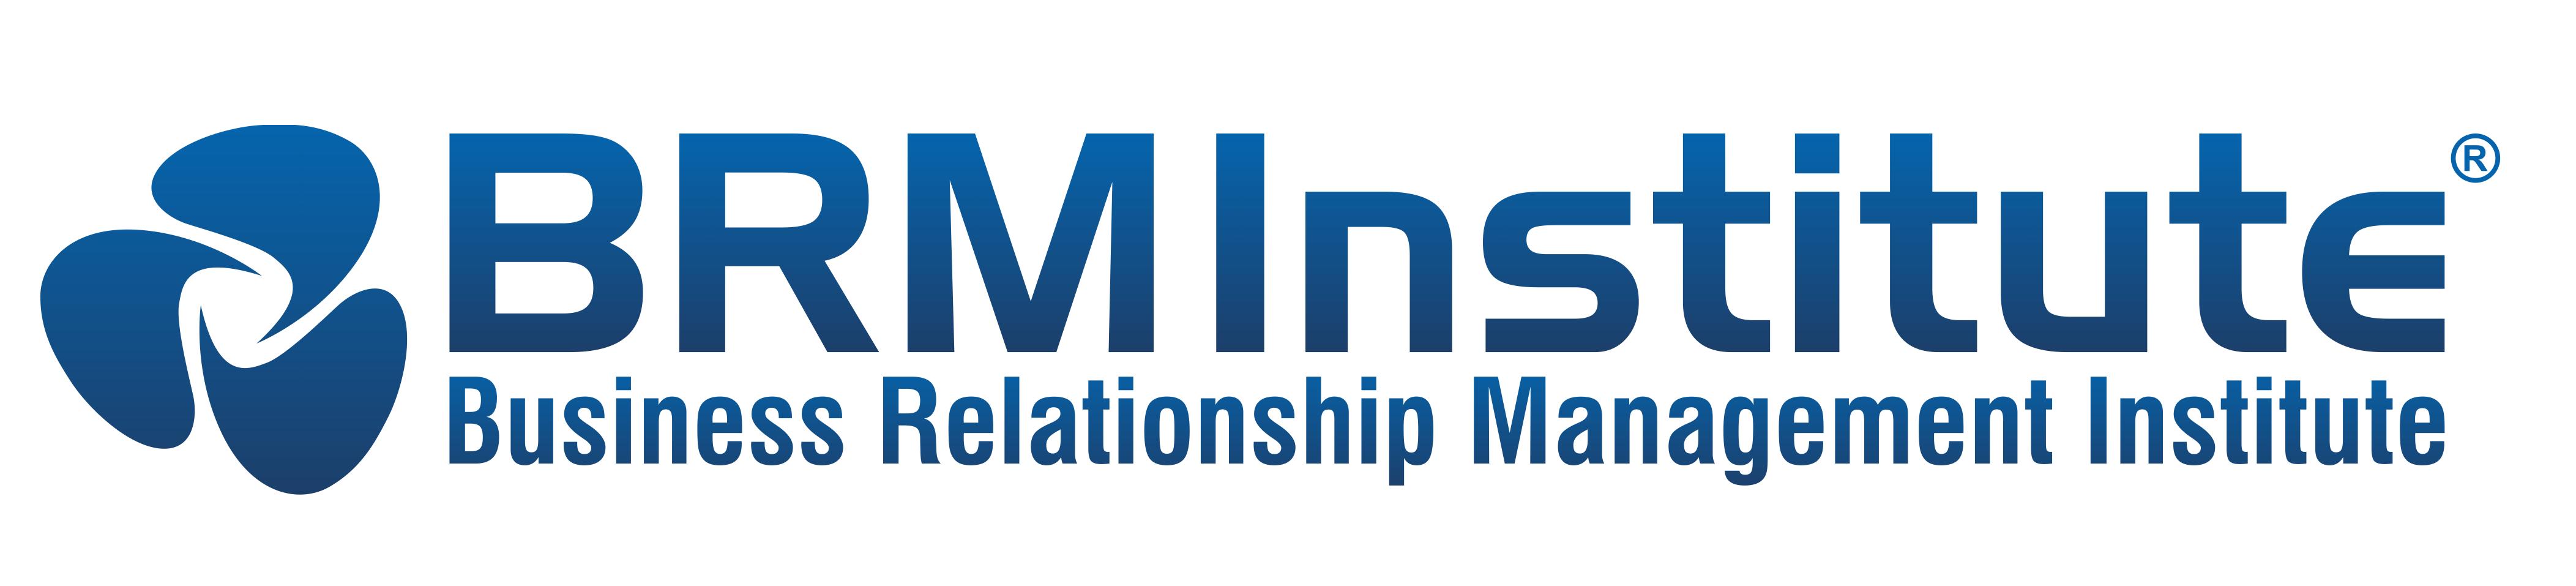 Business Relationship Management Institute, Inc.